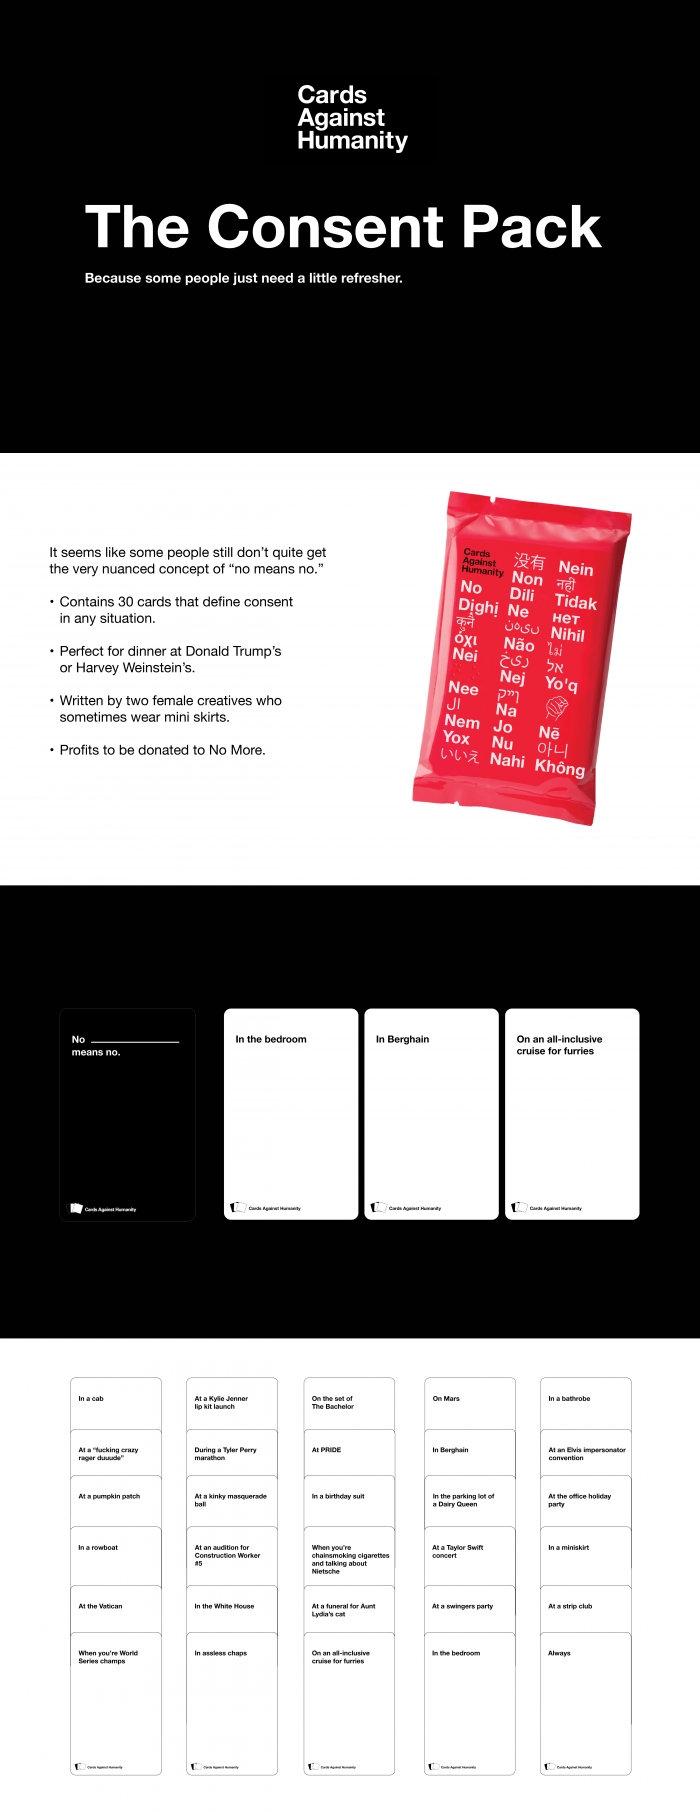 cardsagainsthumanity_theconsentpack.jpg